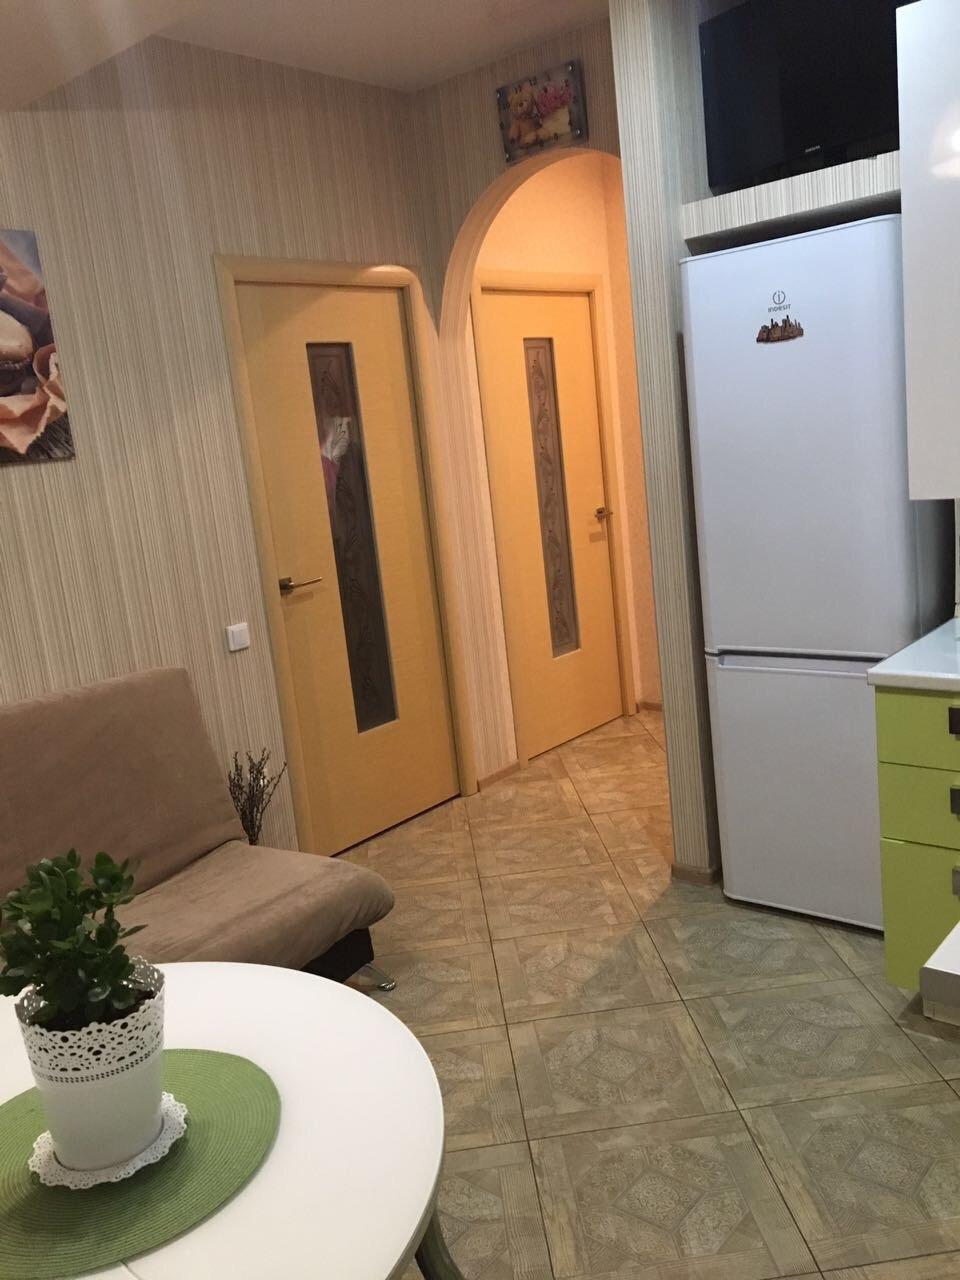 Продажа квартир: 2-комнатная квартира, Краснодарский край, Сочи, Молодогвардейская ул., фото 1